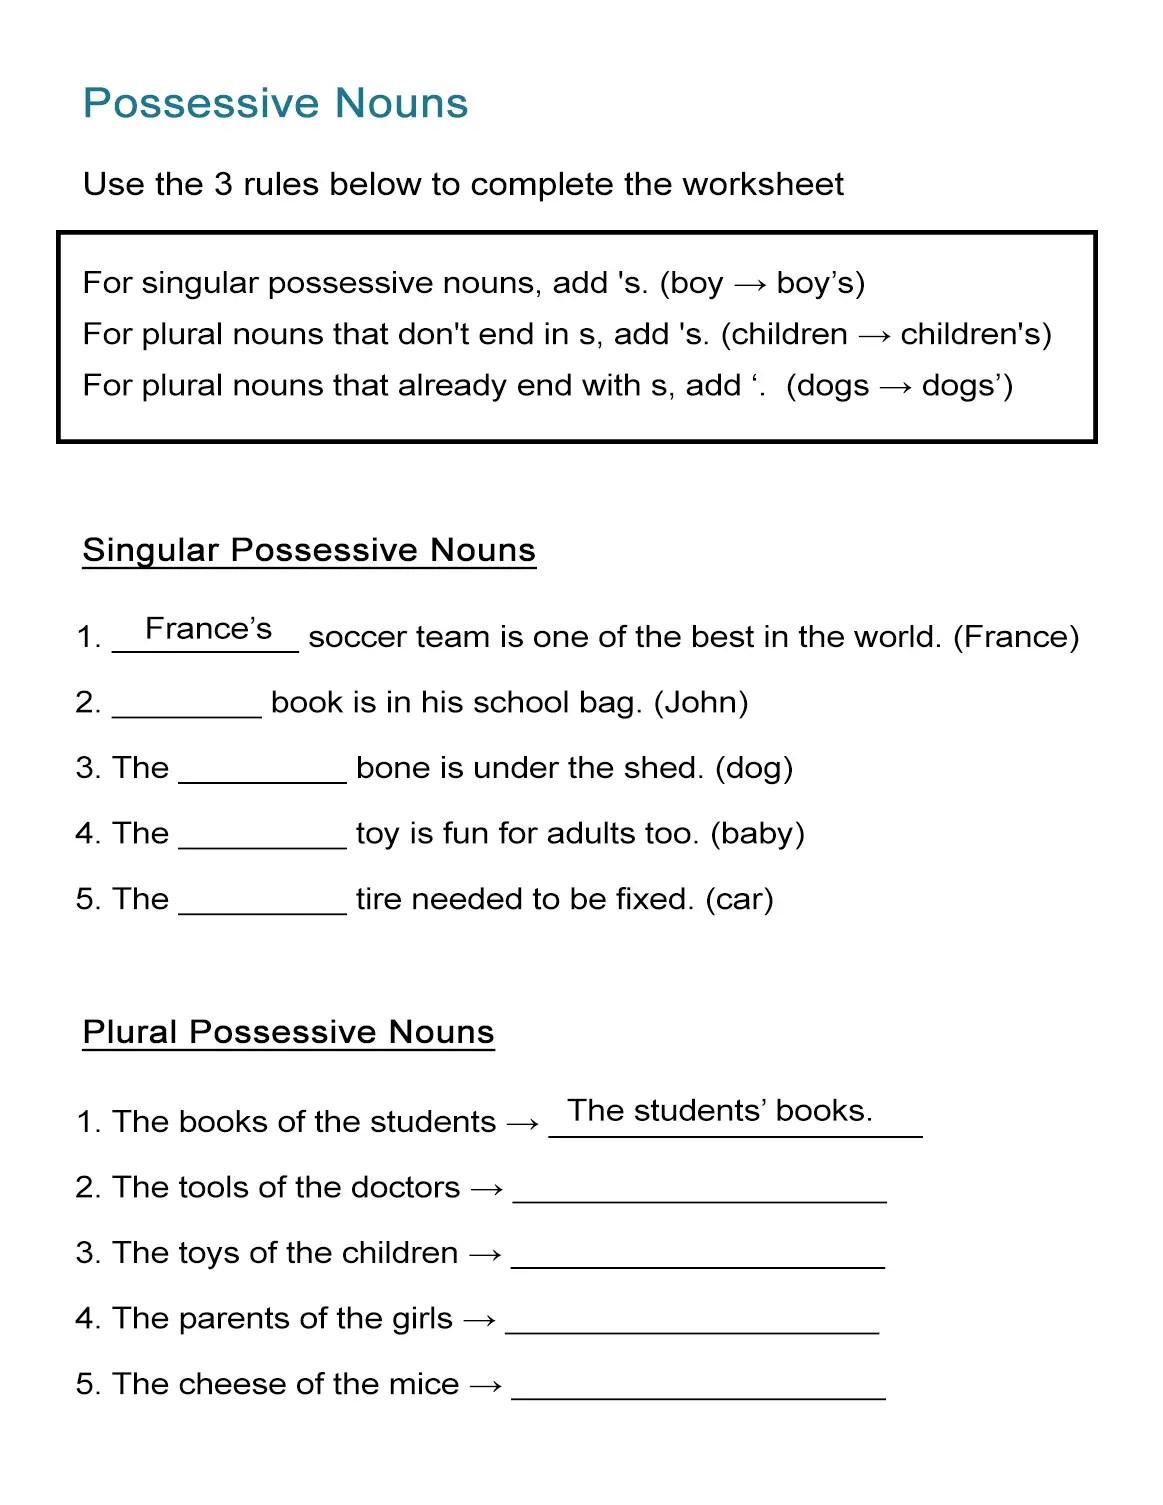 Possessive Nouns Worksheet Singular And Plural Nouns